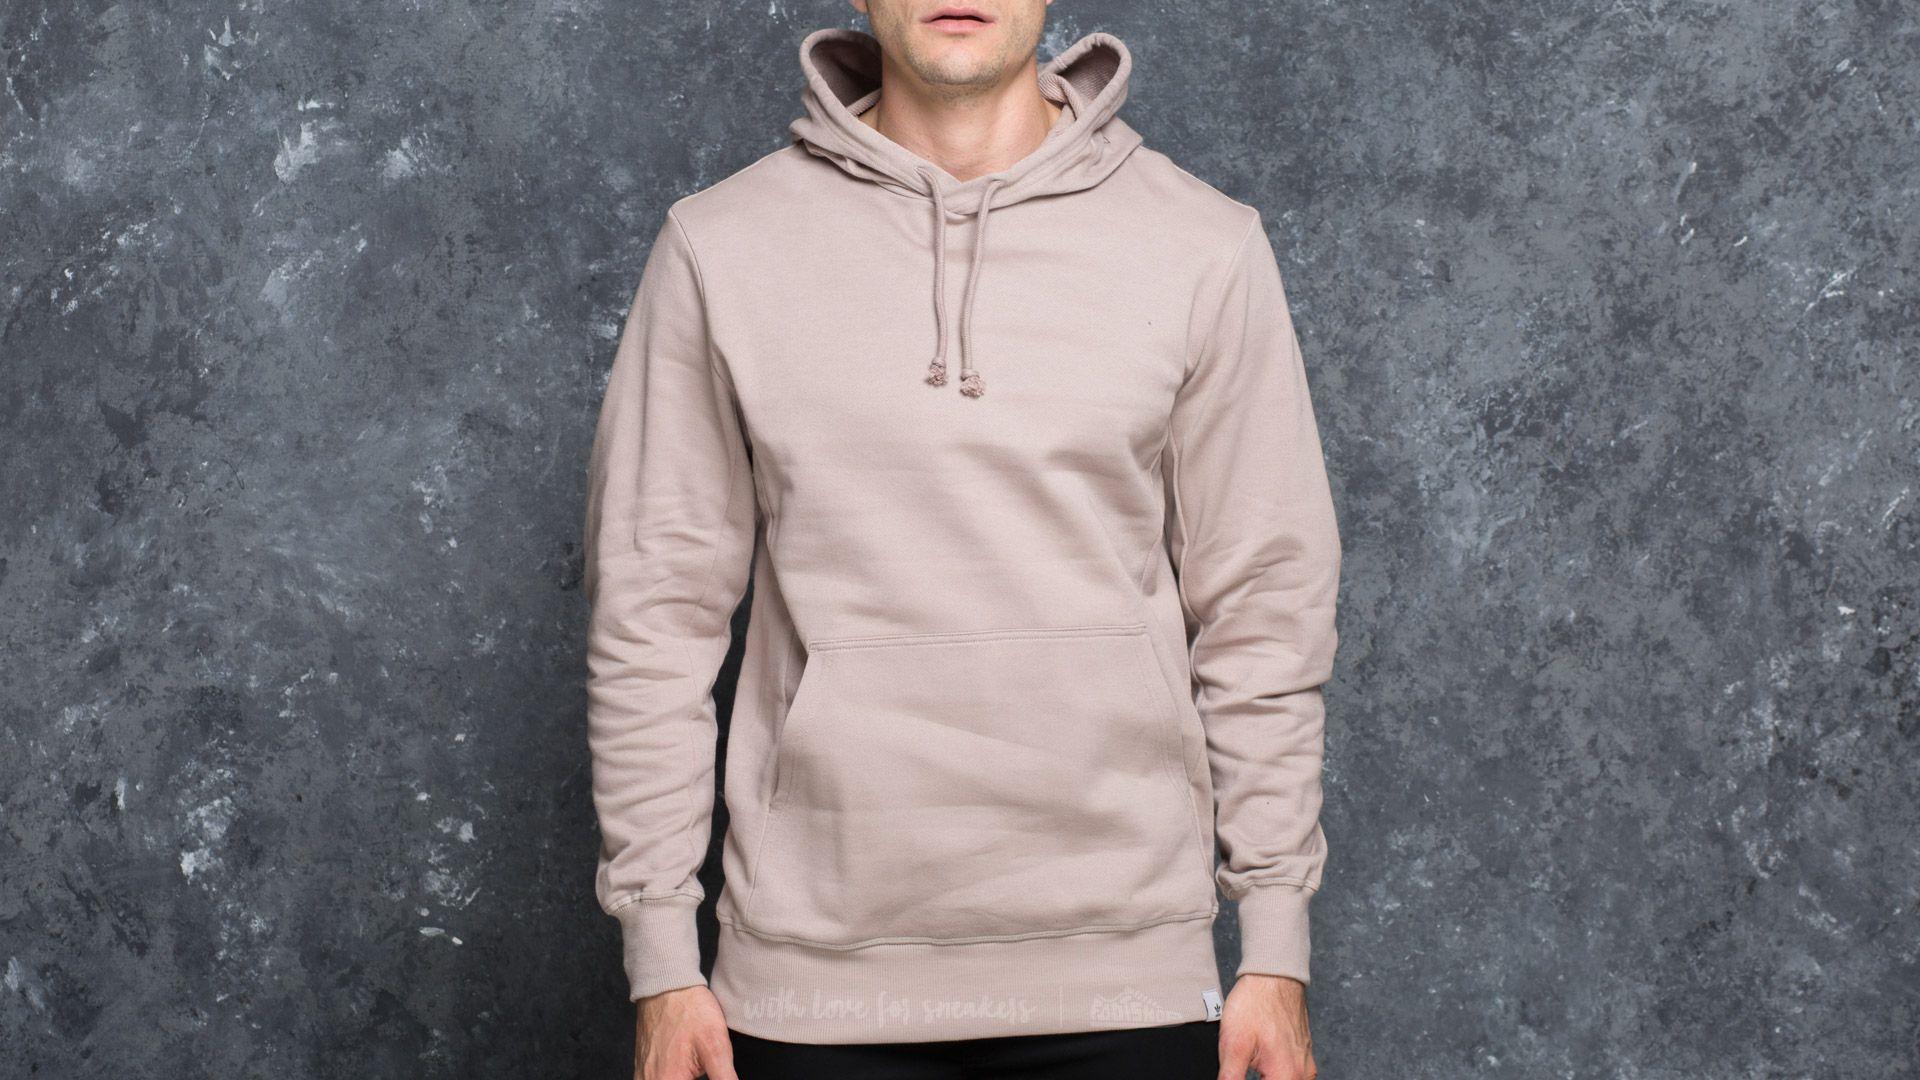 Adidas Xbyo Pullover Hoodie Vapour Grey